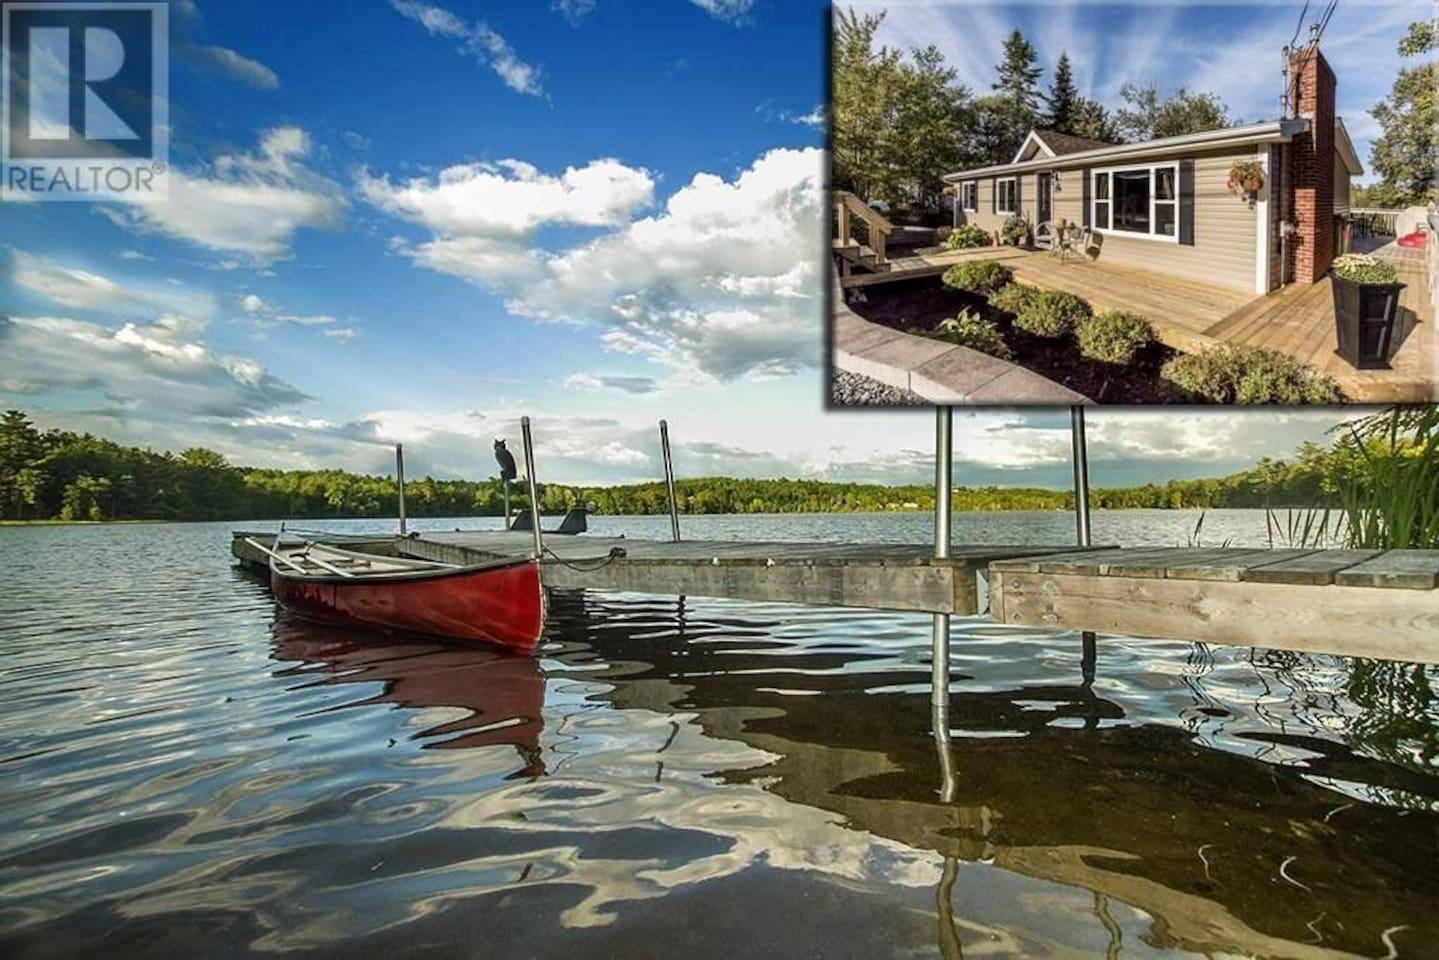 Canoe or row the lake